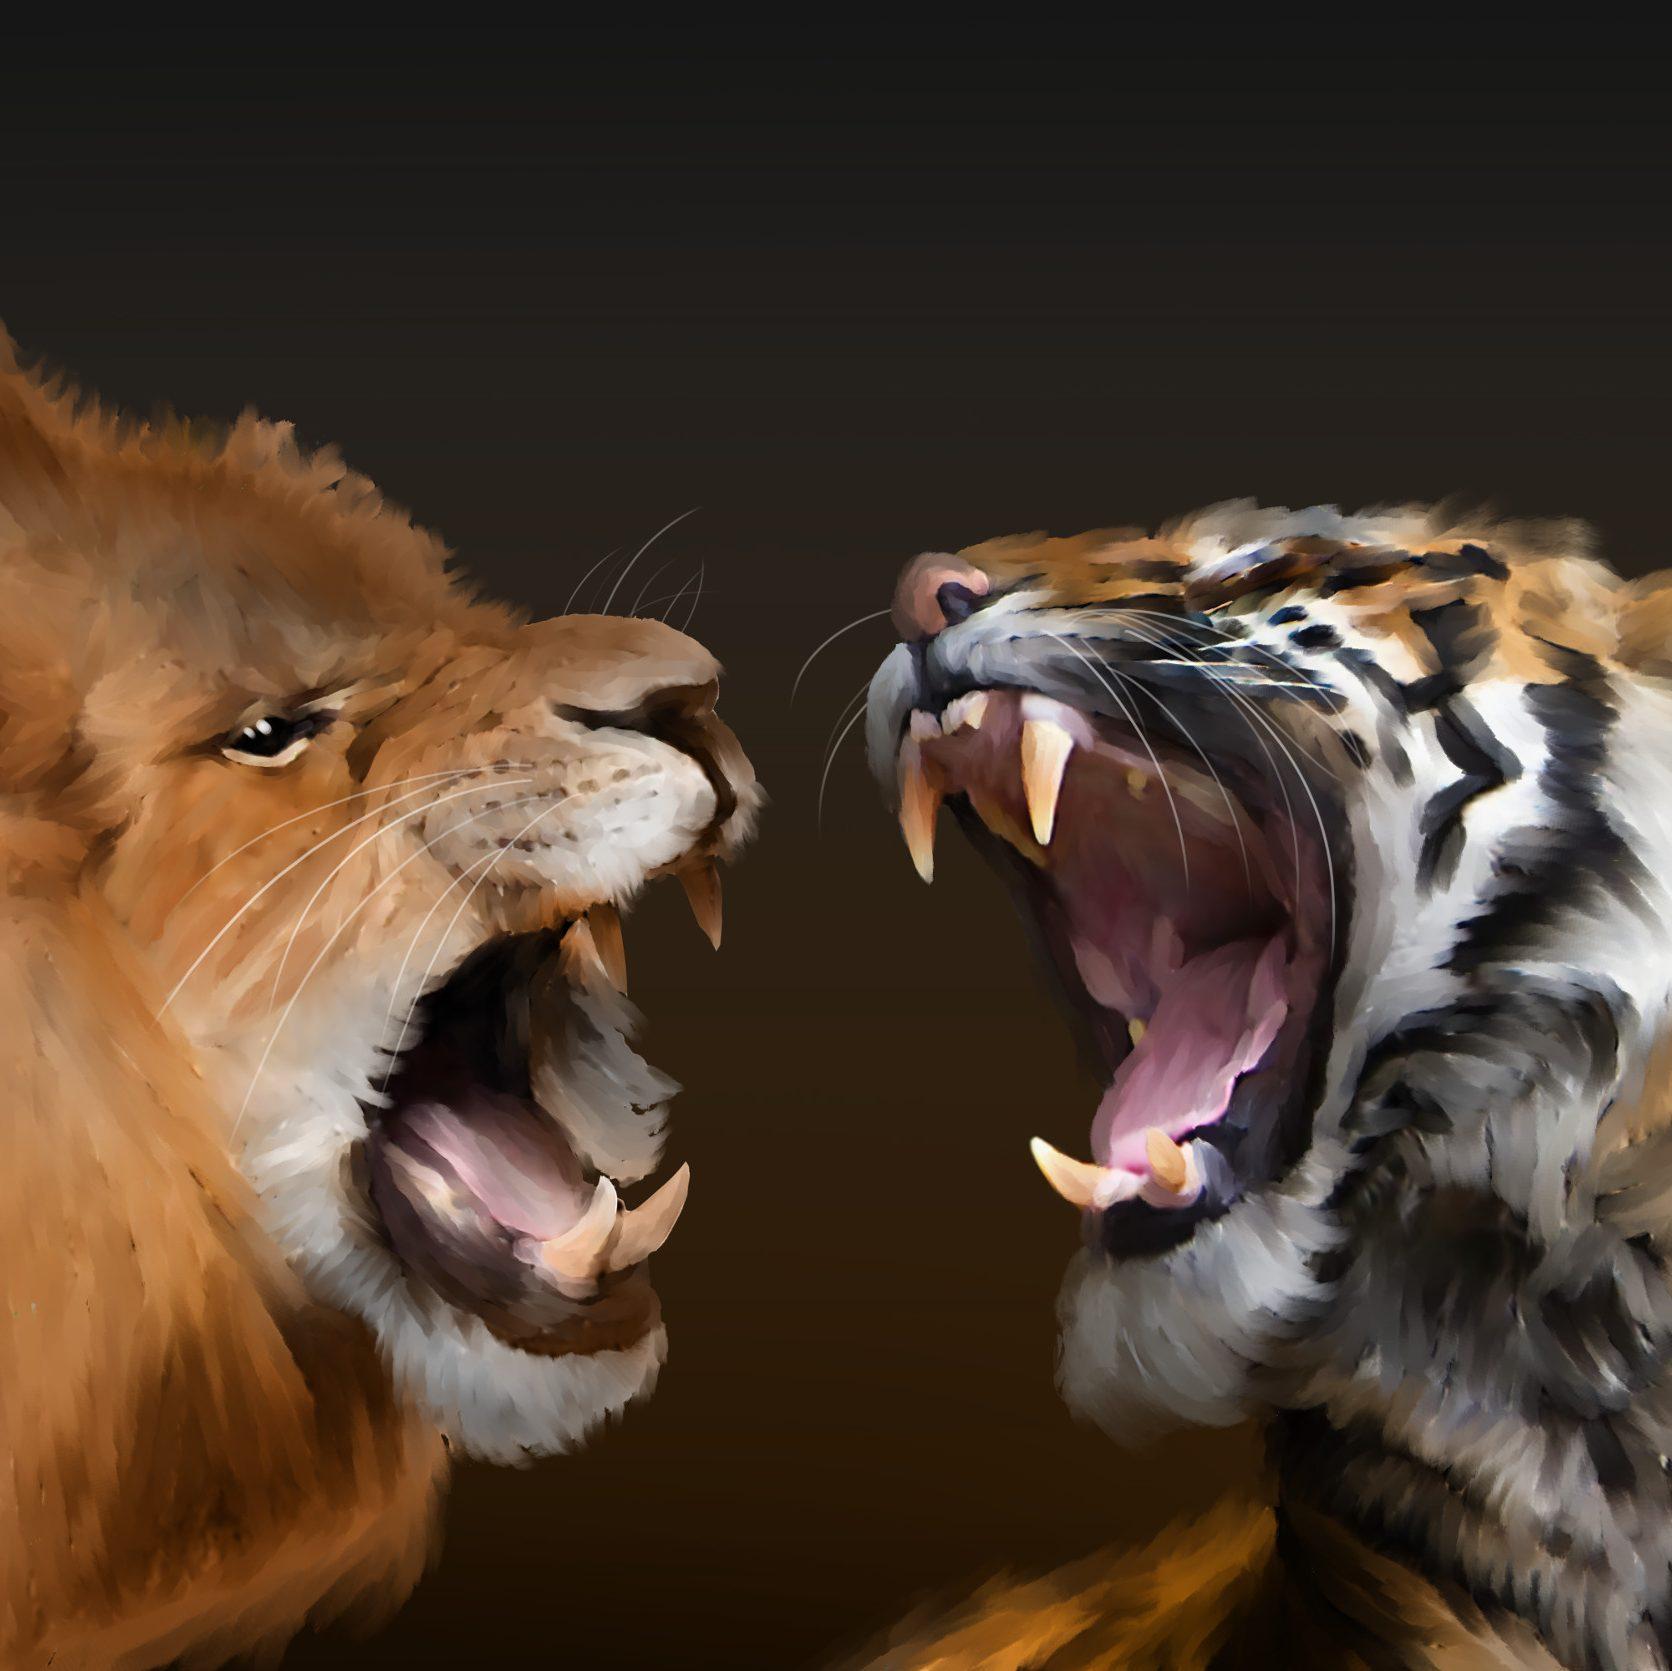 Tigers vs Lions